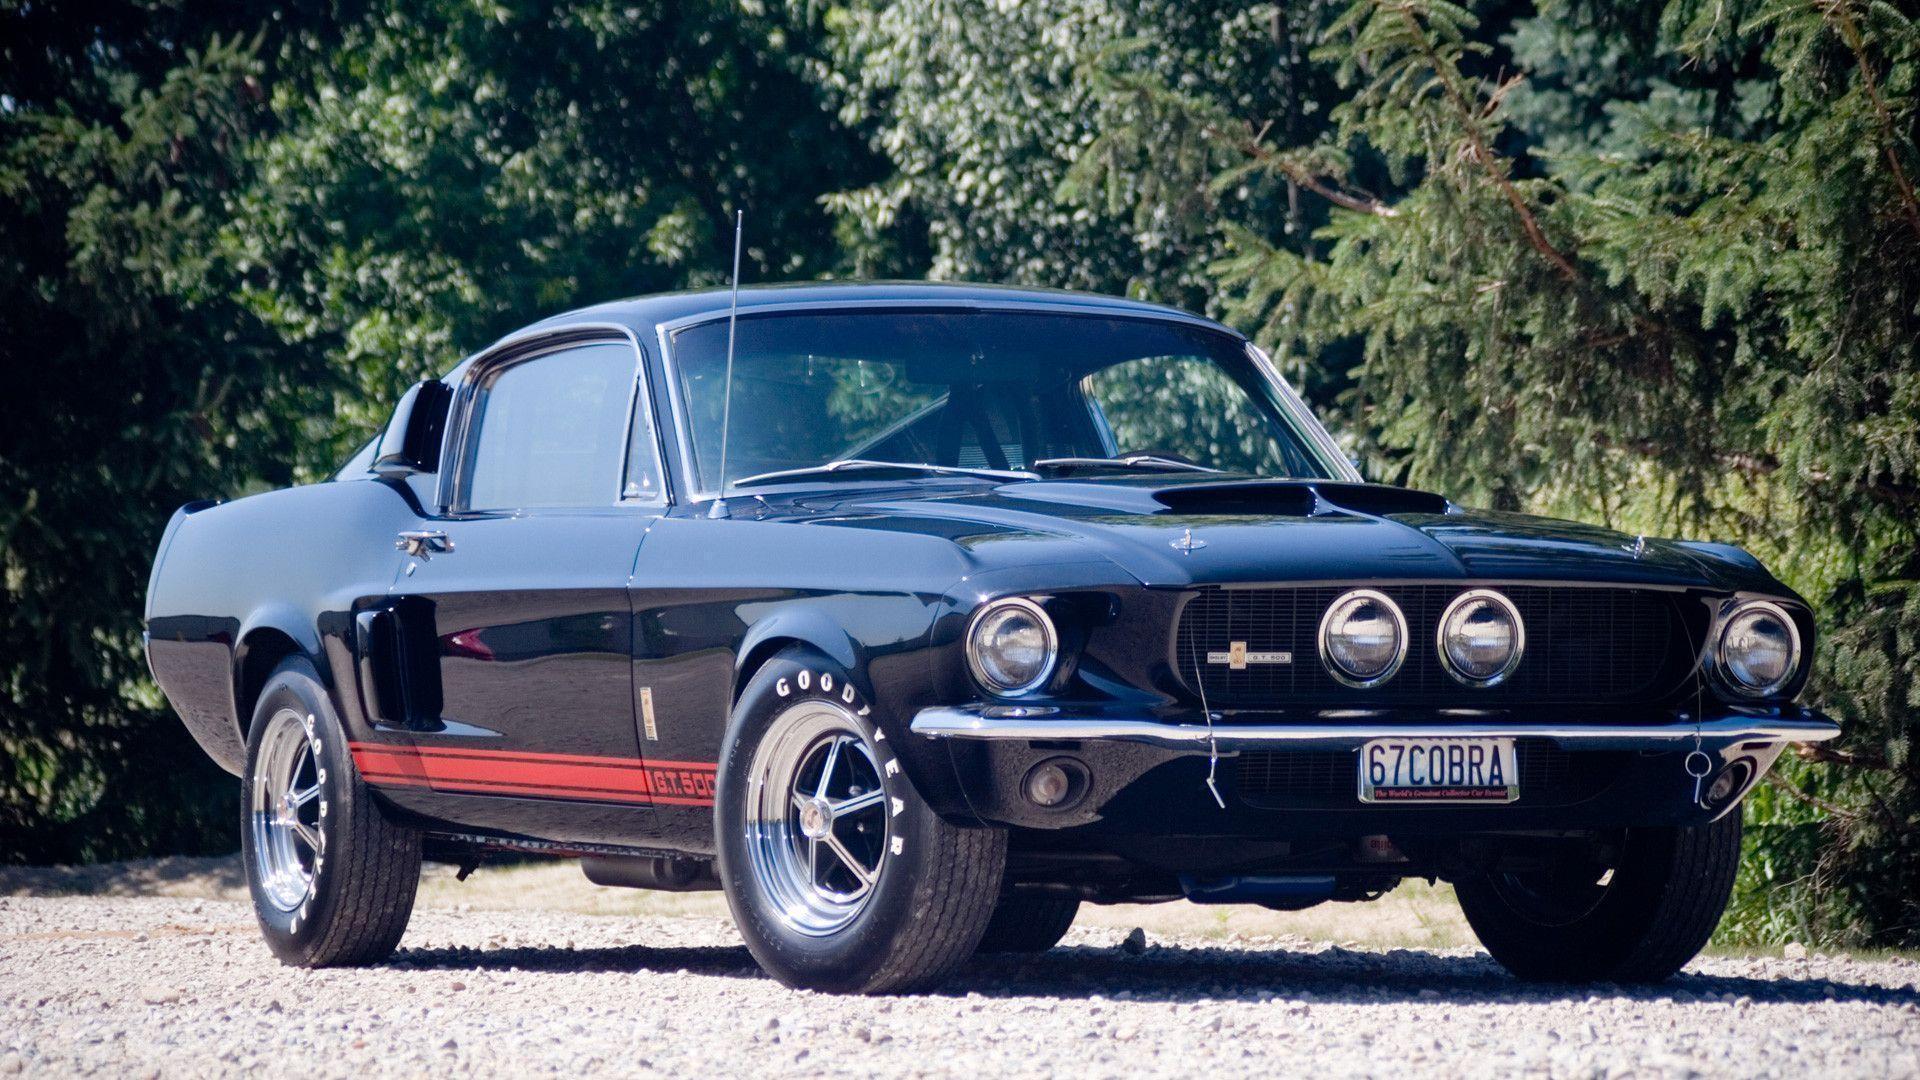 American Muscle Car Desktop Wallpapers 1967 Shelby Gt500 Wallpapers Wallpaper Cave